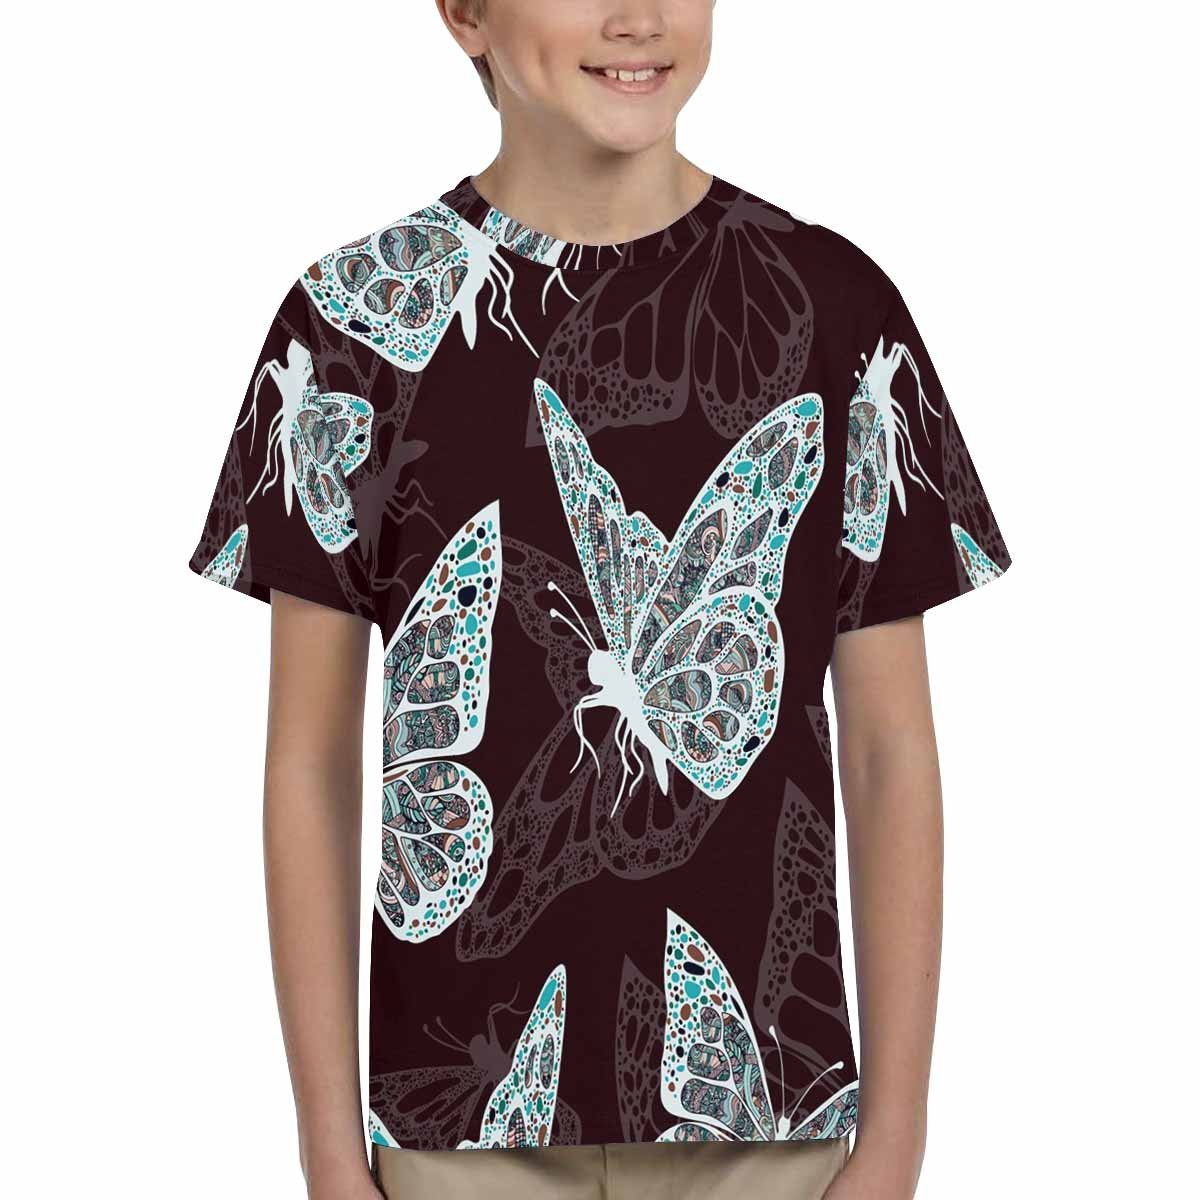 Hippie XS-XL INTERESTPRINT Youth T-Shirts Butterflies in Style Boho